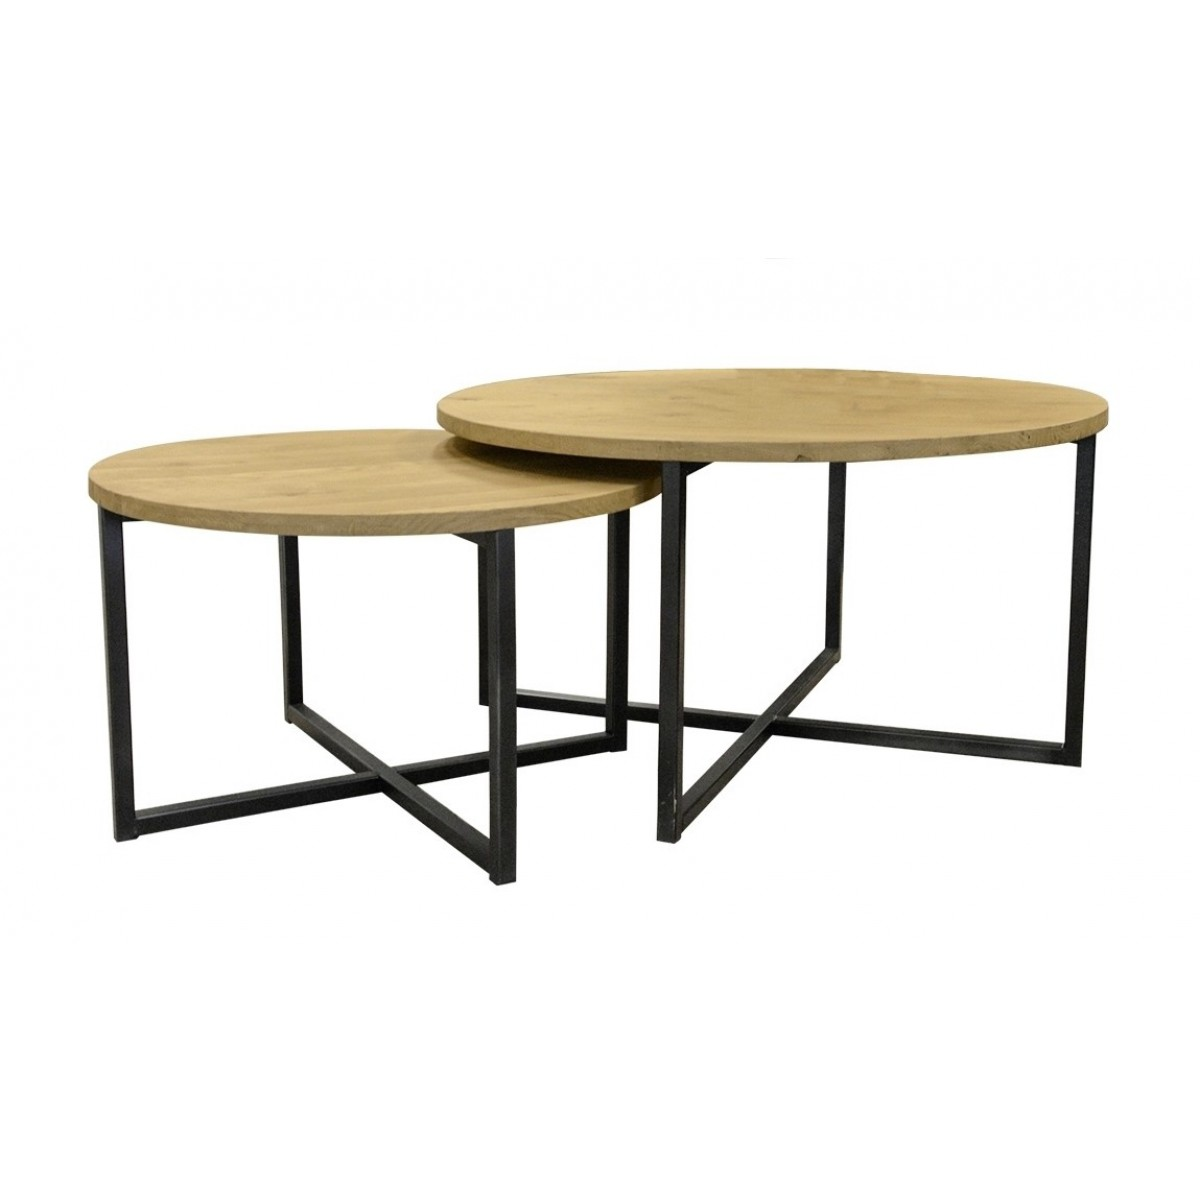 Set van 2 salontafels rond metaalframe eiken blad i live for Salontafel rond design